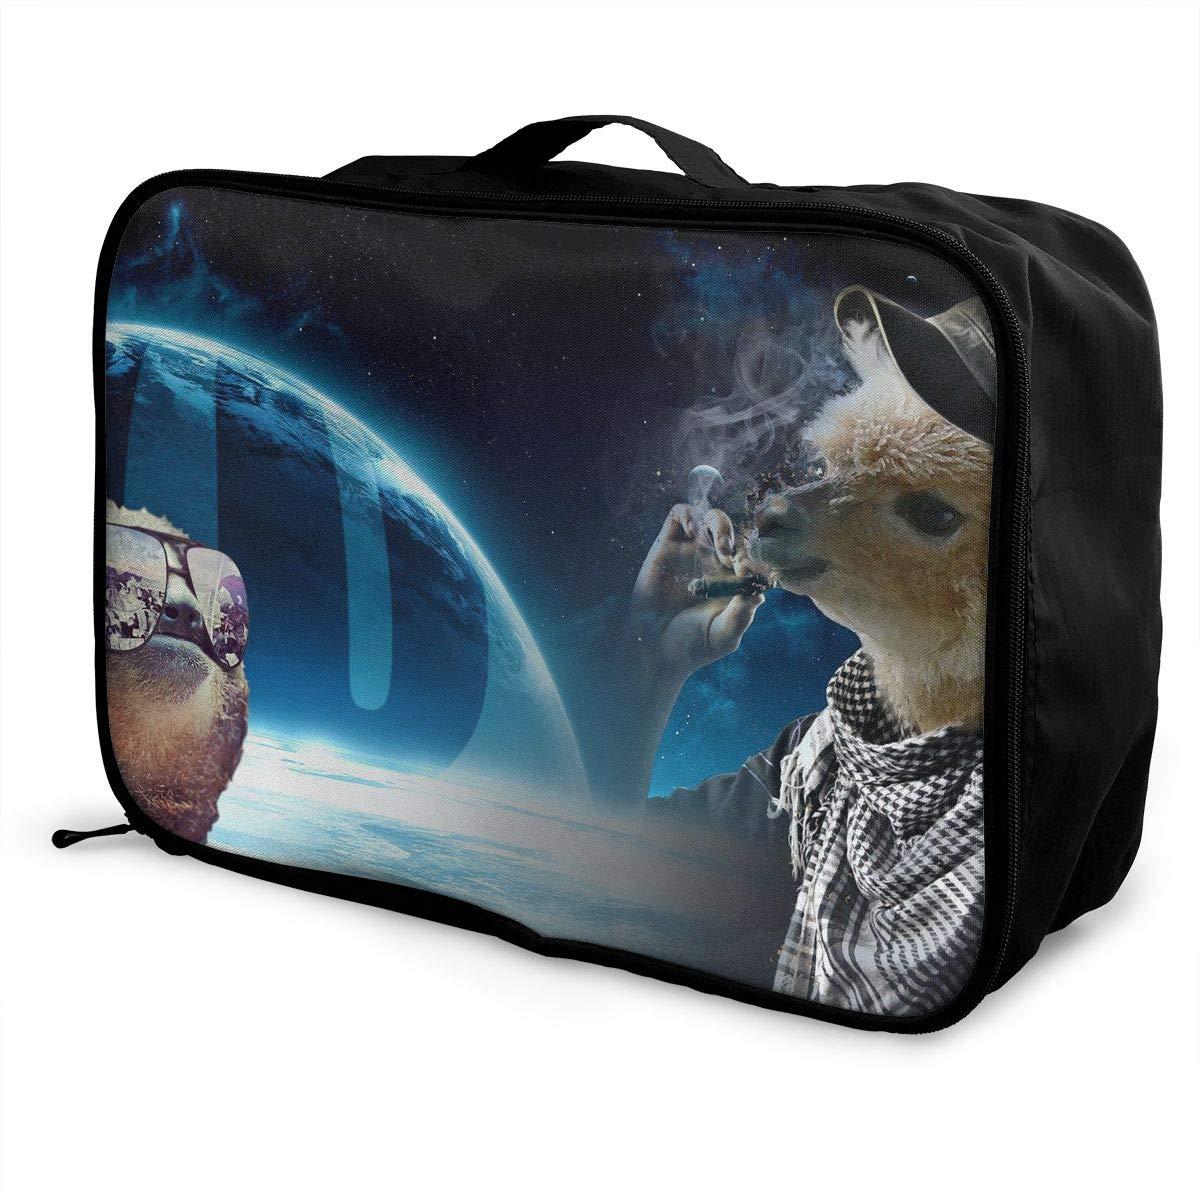 Travel Luggage Duffle Bag Lightweight Portable Handbag Llama Large Capacity Waterproof Foldable Storage Tote